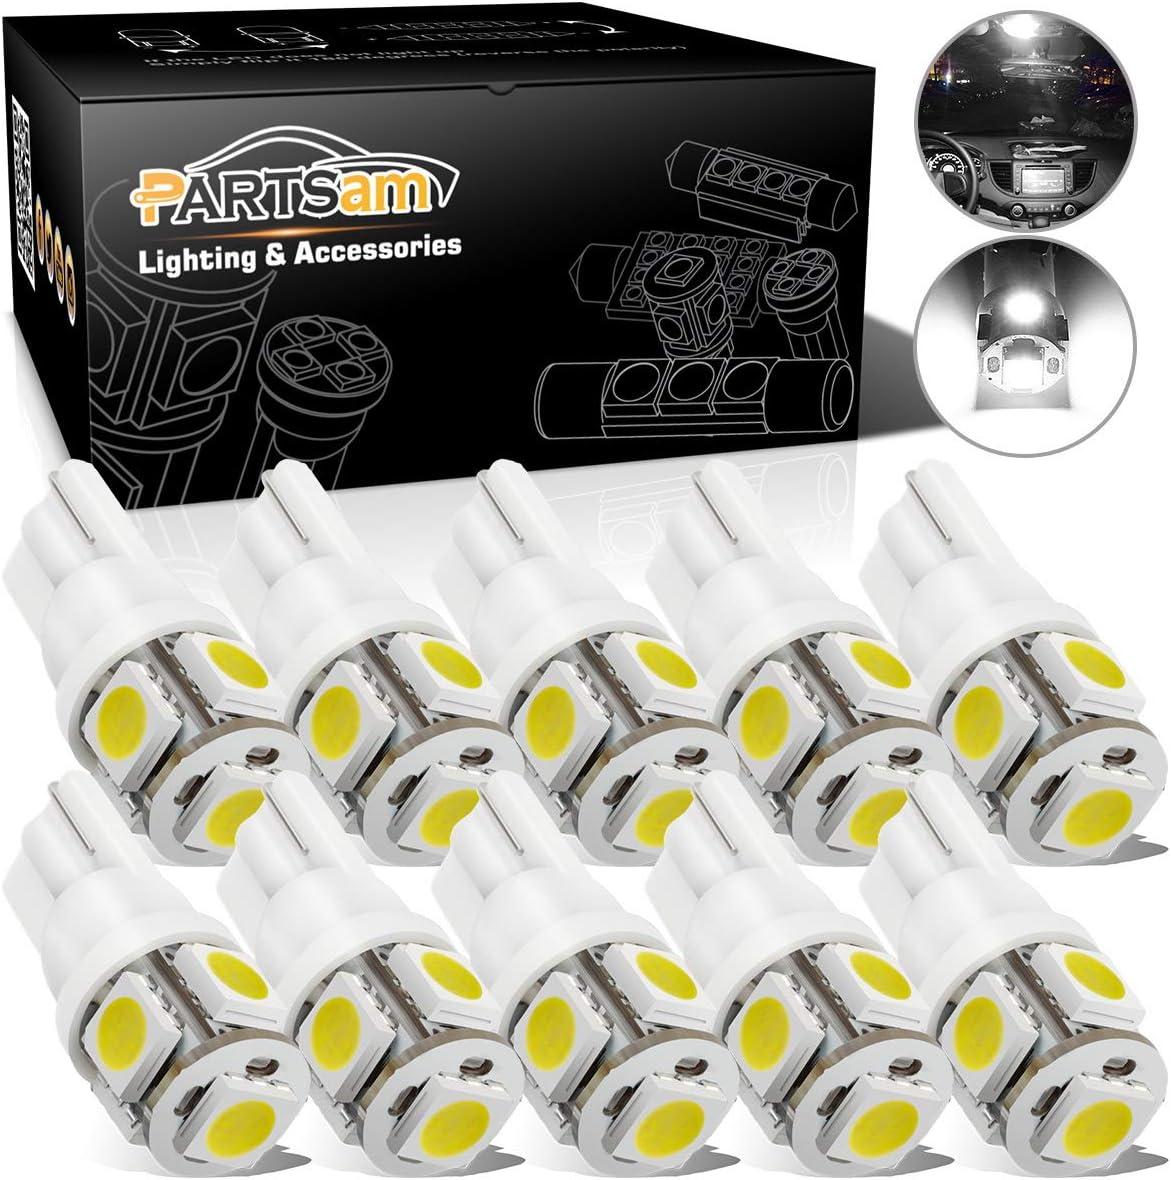 10Pcs White T10 194 W5W 501 7020 SMD LED Interior Dome Map License Light Bulb